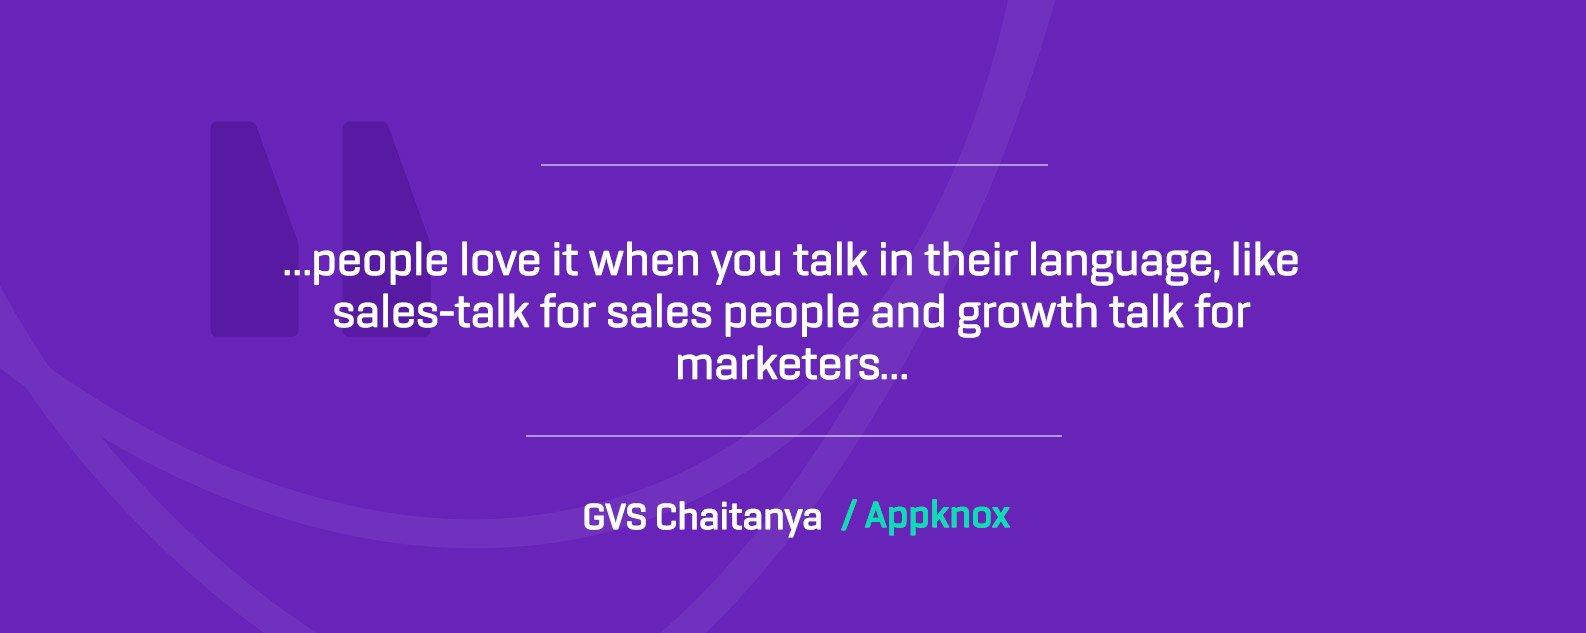 GVS - Appknox